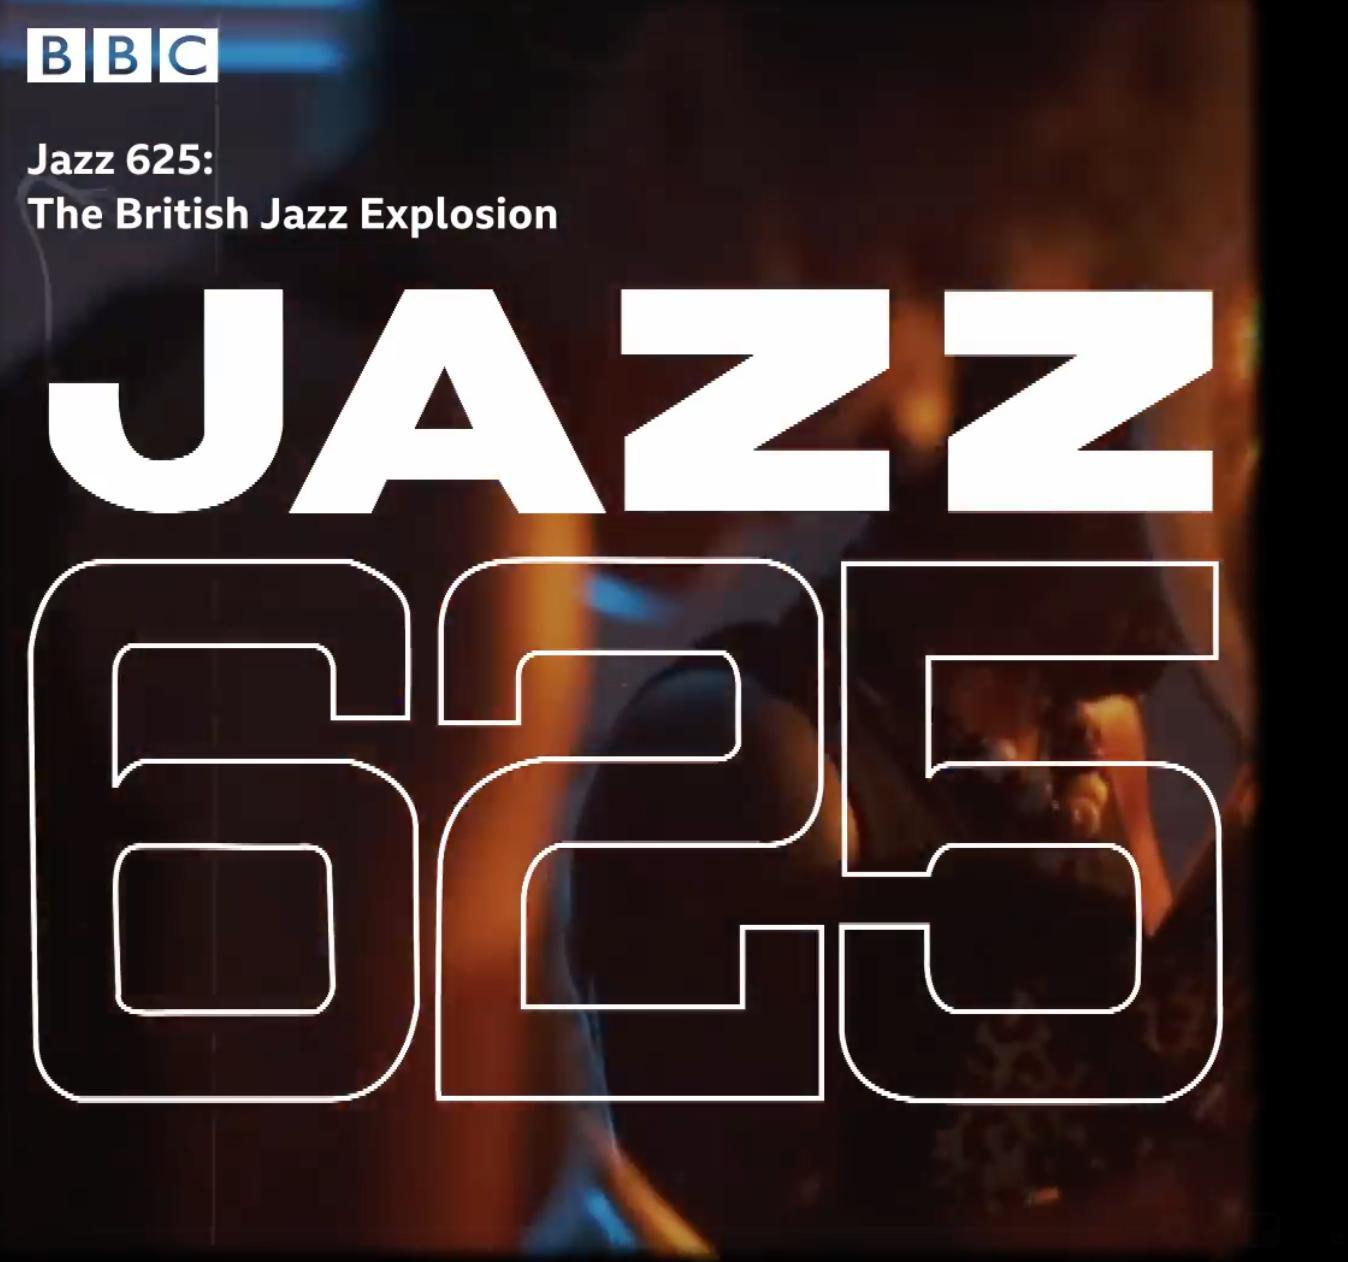 Jazz 625: The British Jazz Explosion